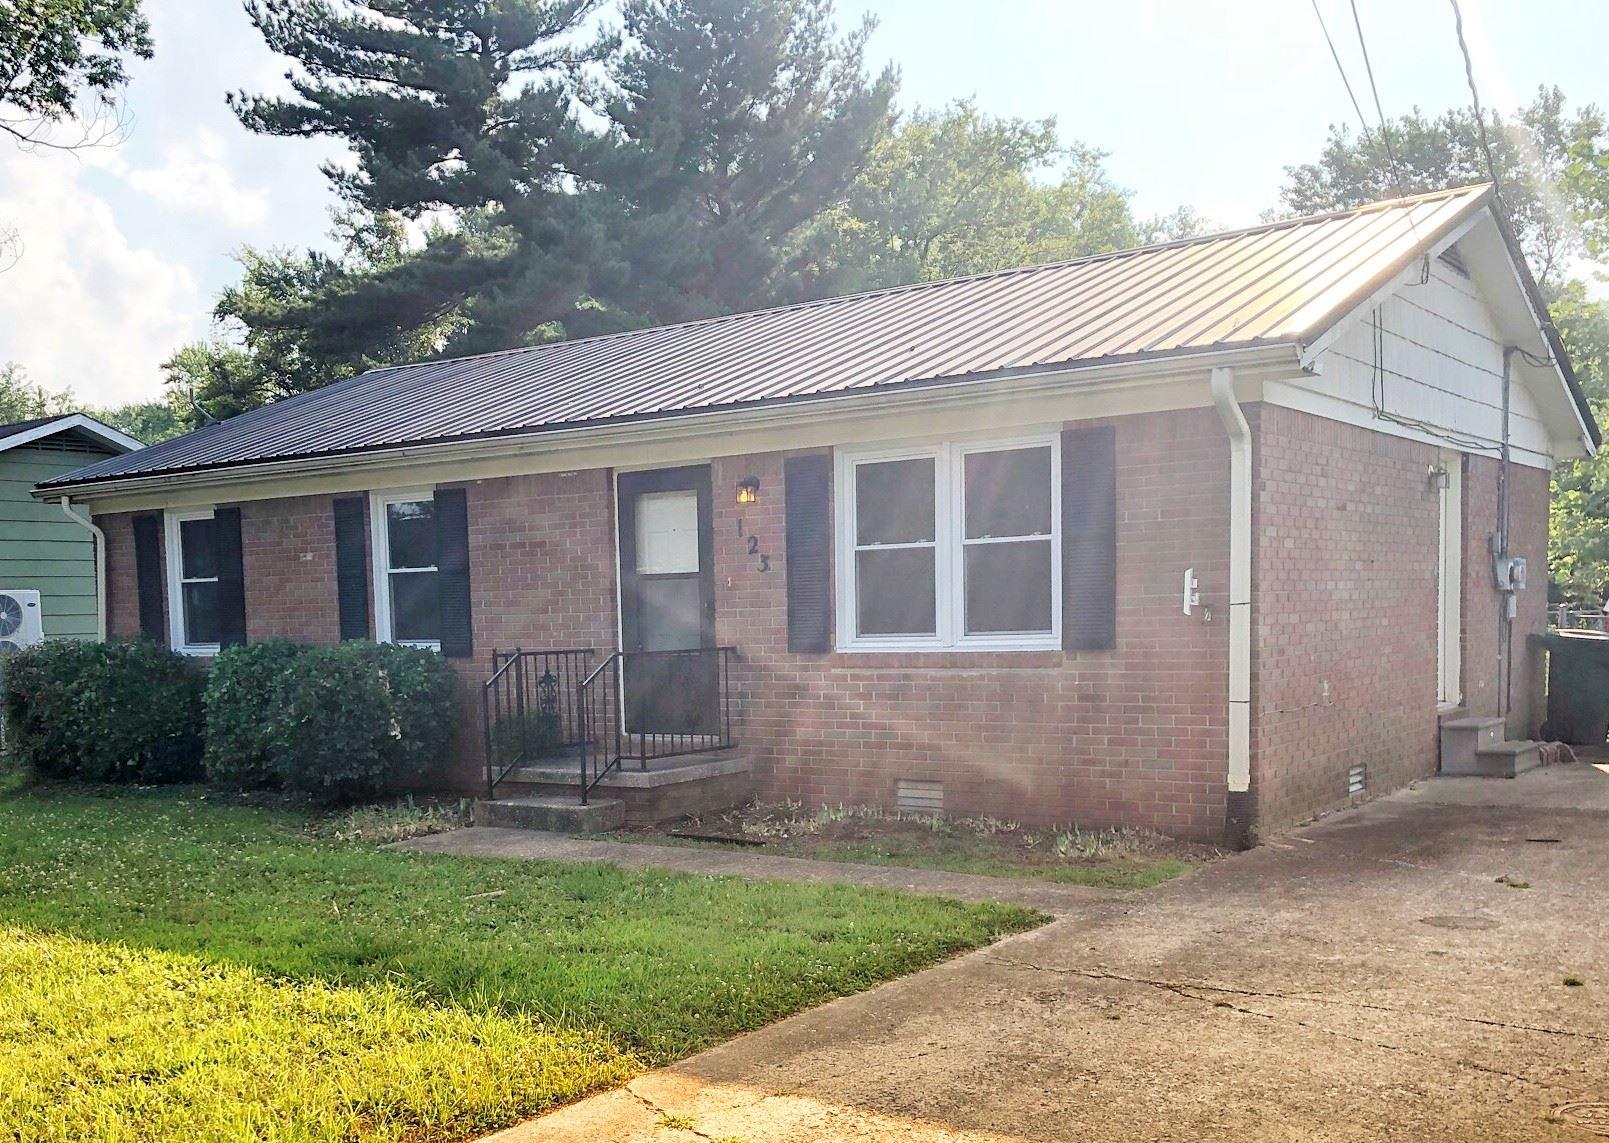 123 Boxwood Dr, Hopkinsville, KY 42240 - MLS#: 2284668